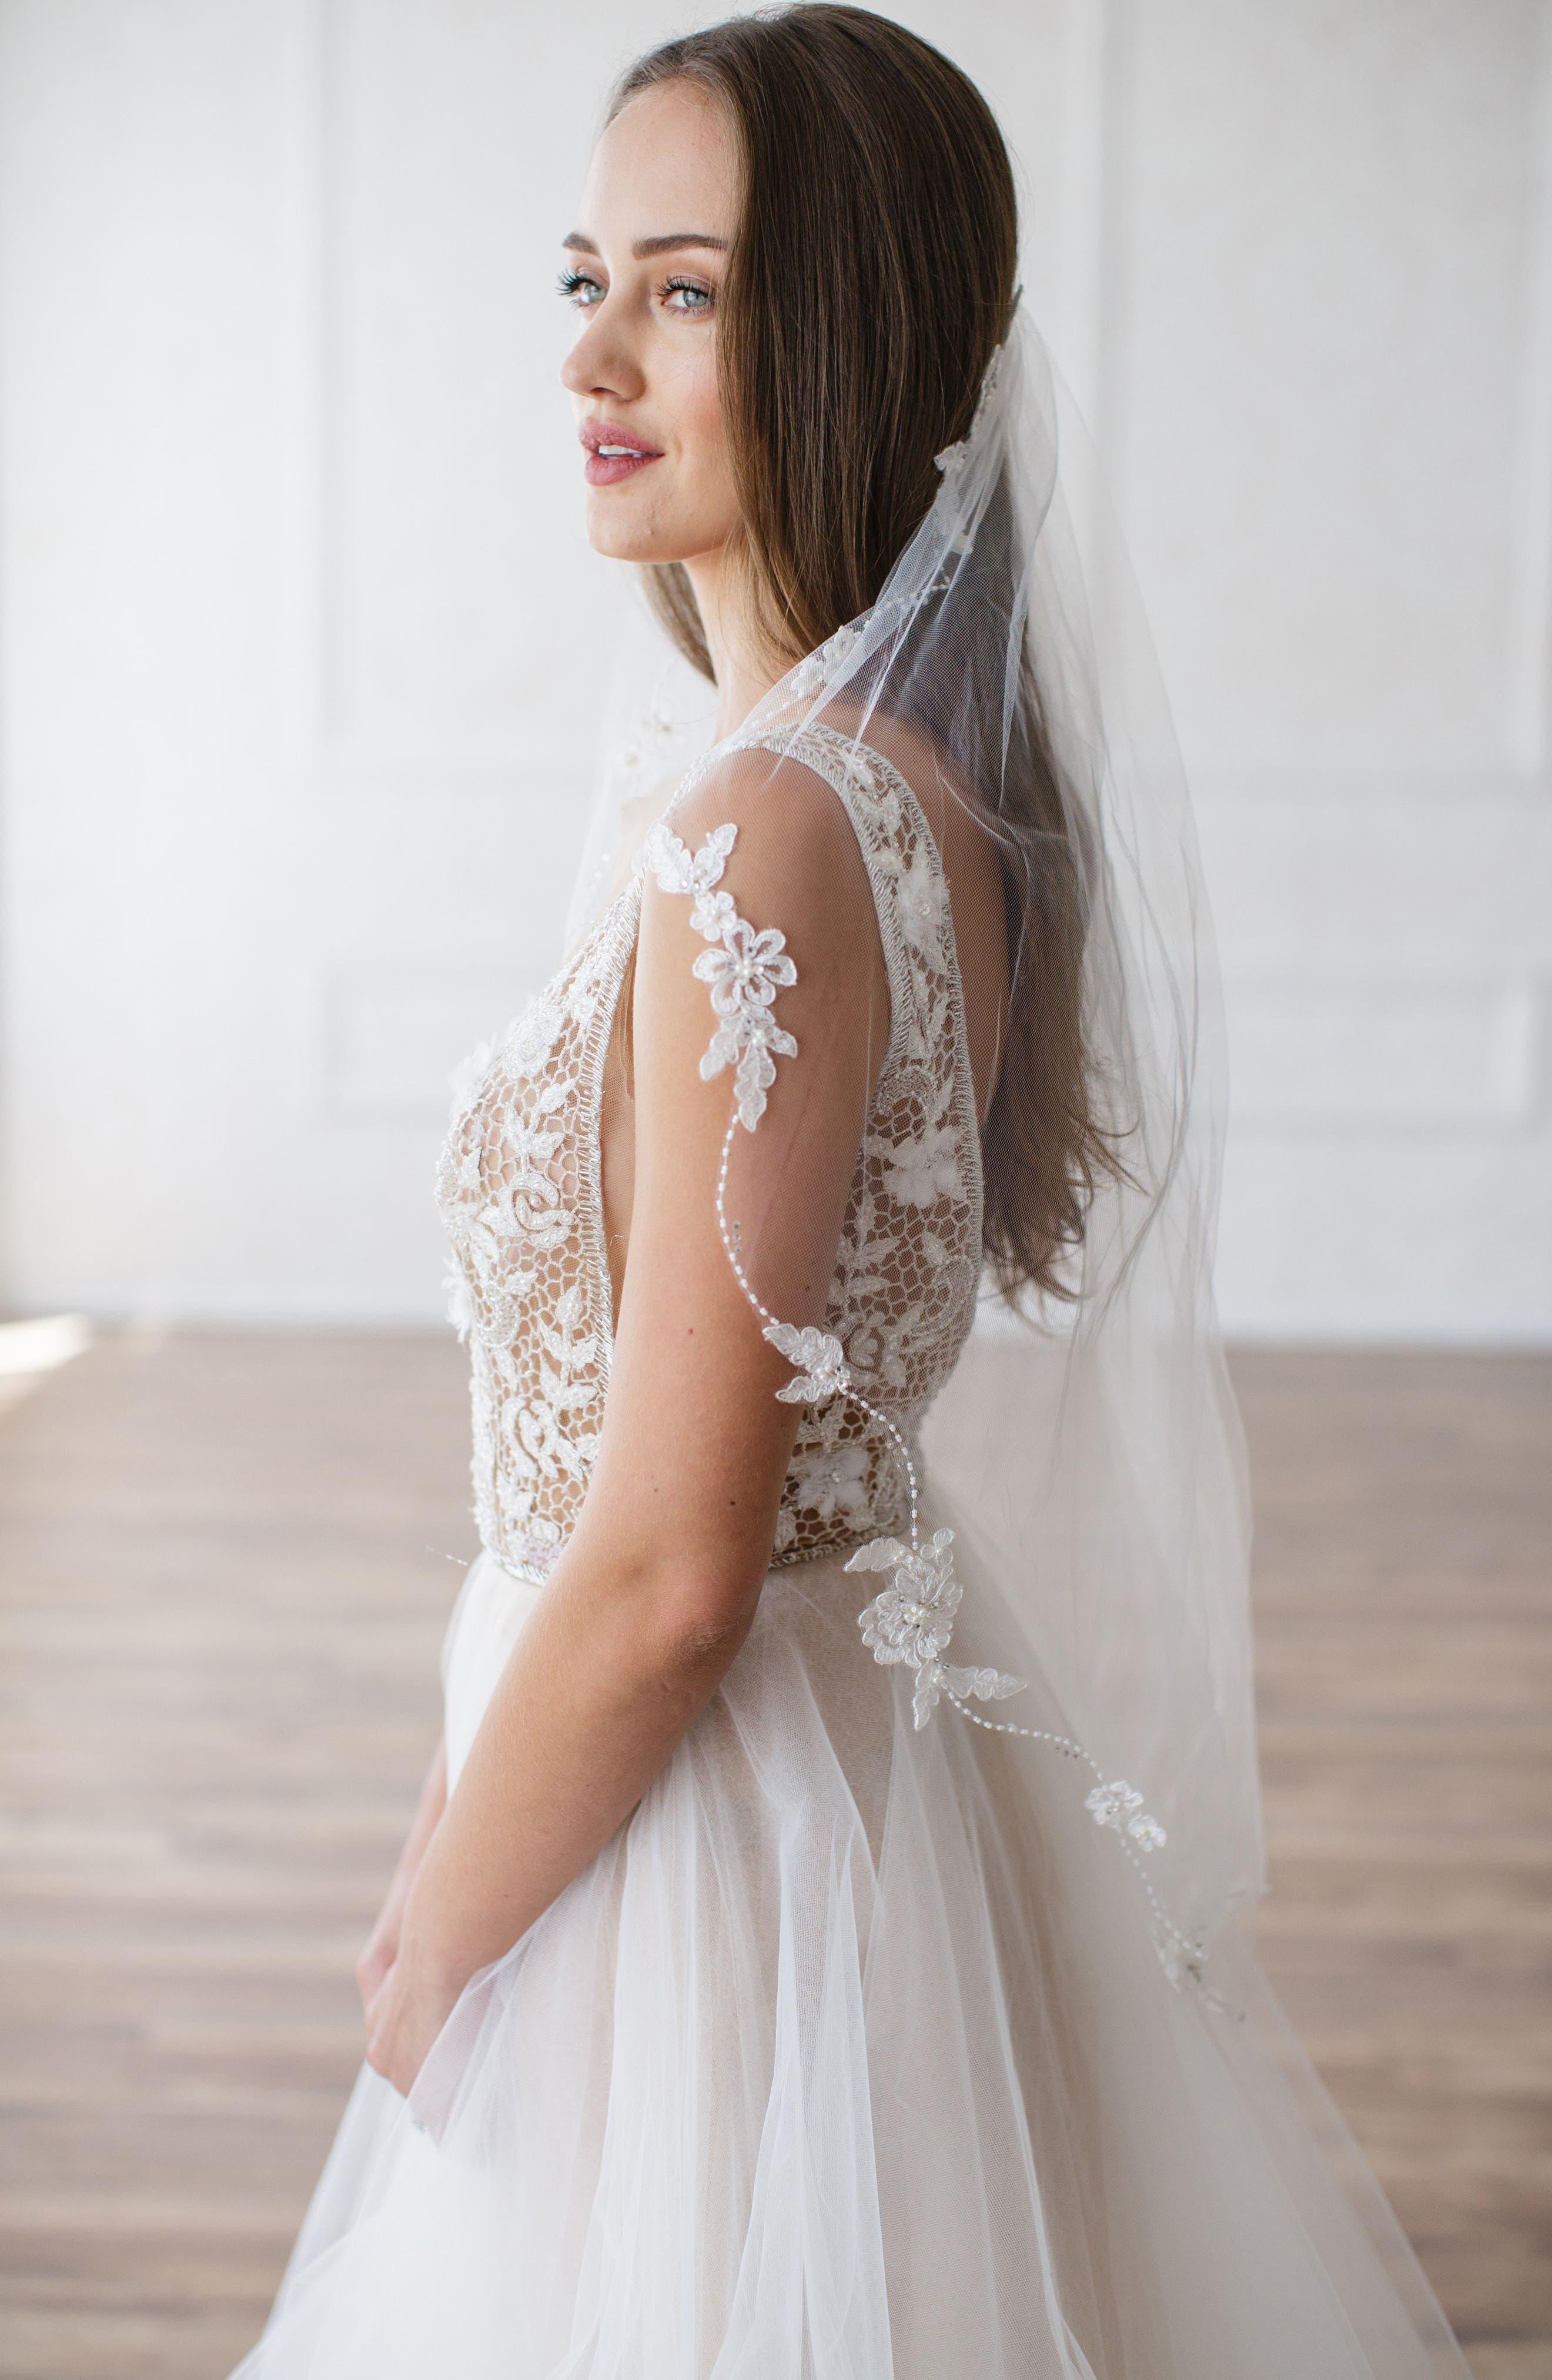 Alternate Image 1 Selected - Brides & Hairpins Mikaela Embellished Veil